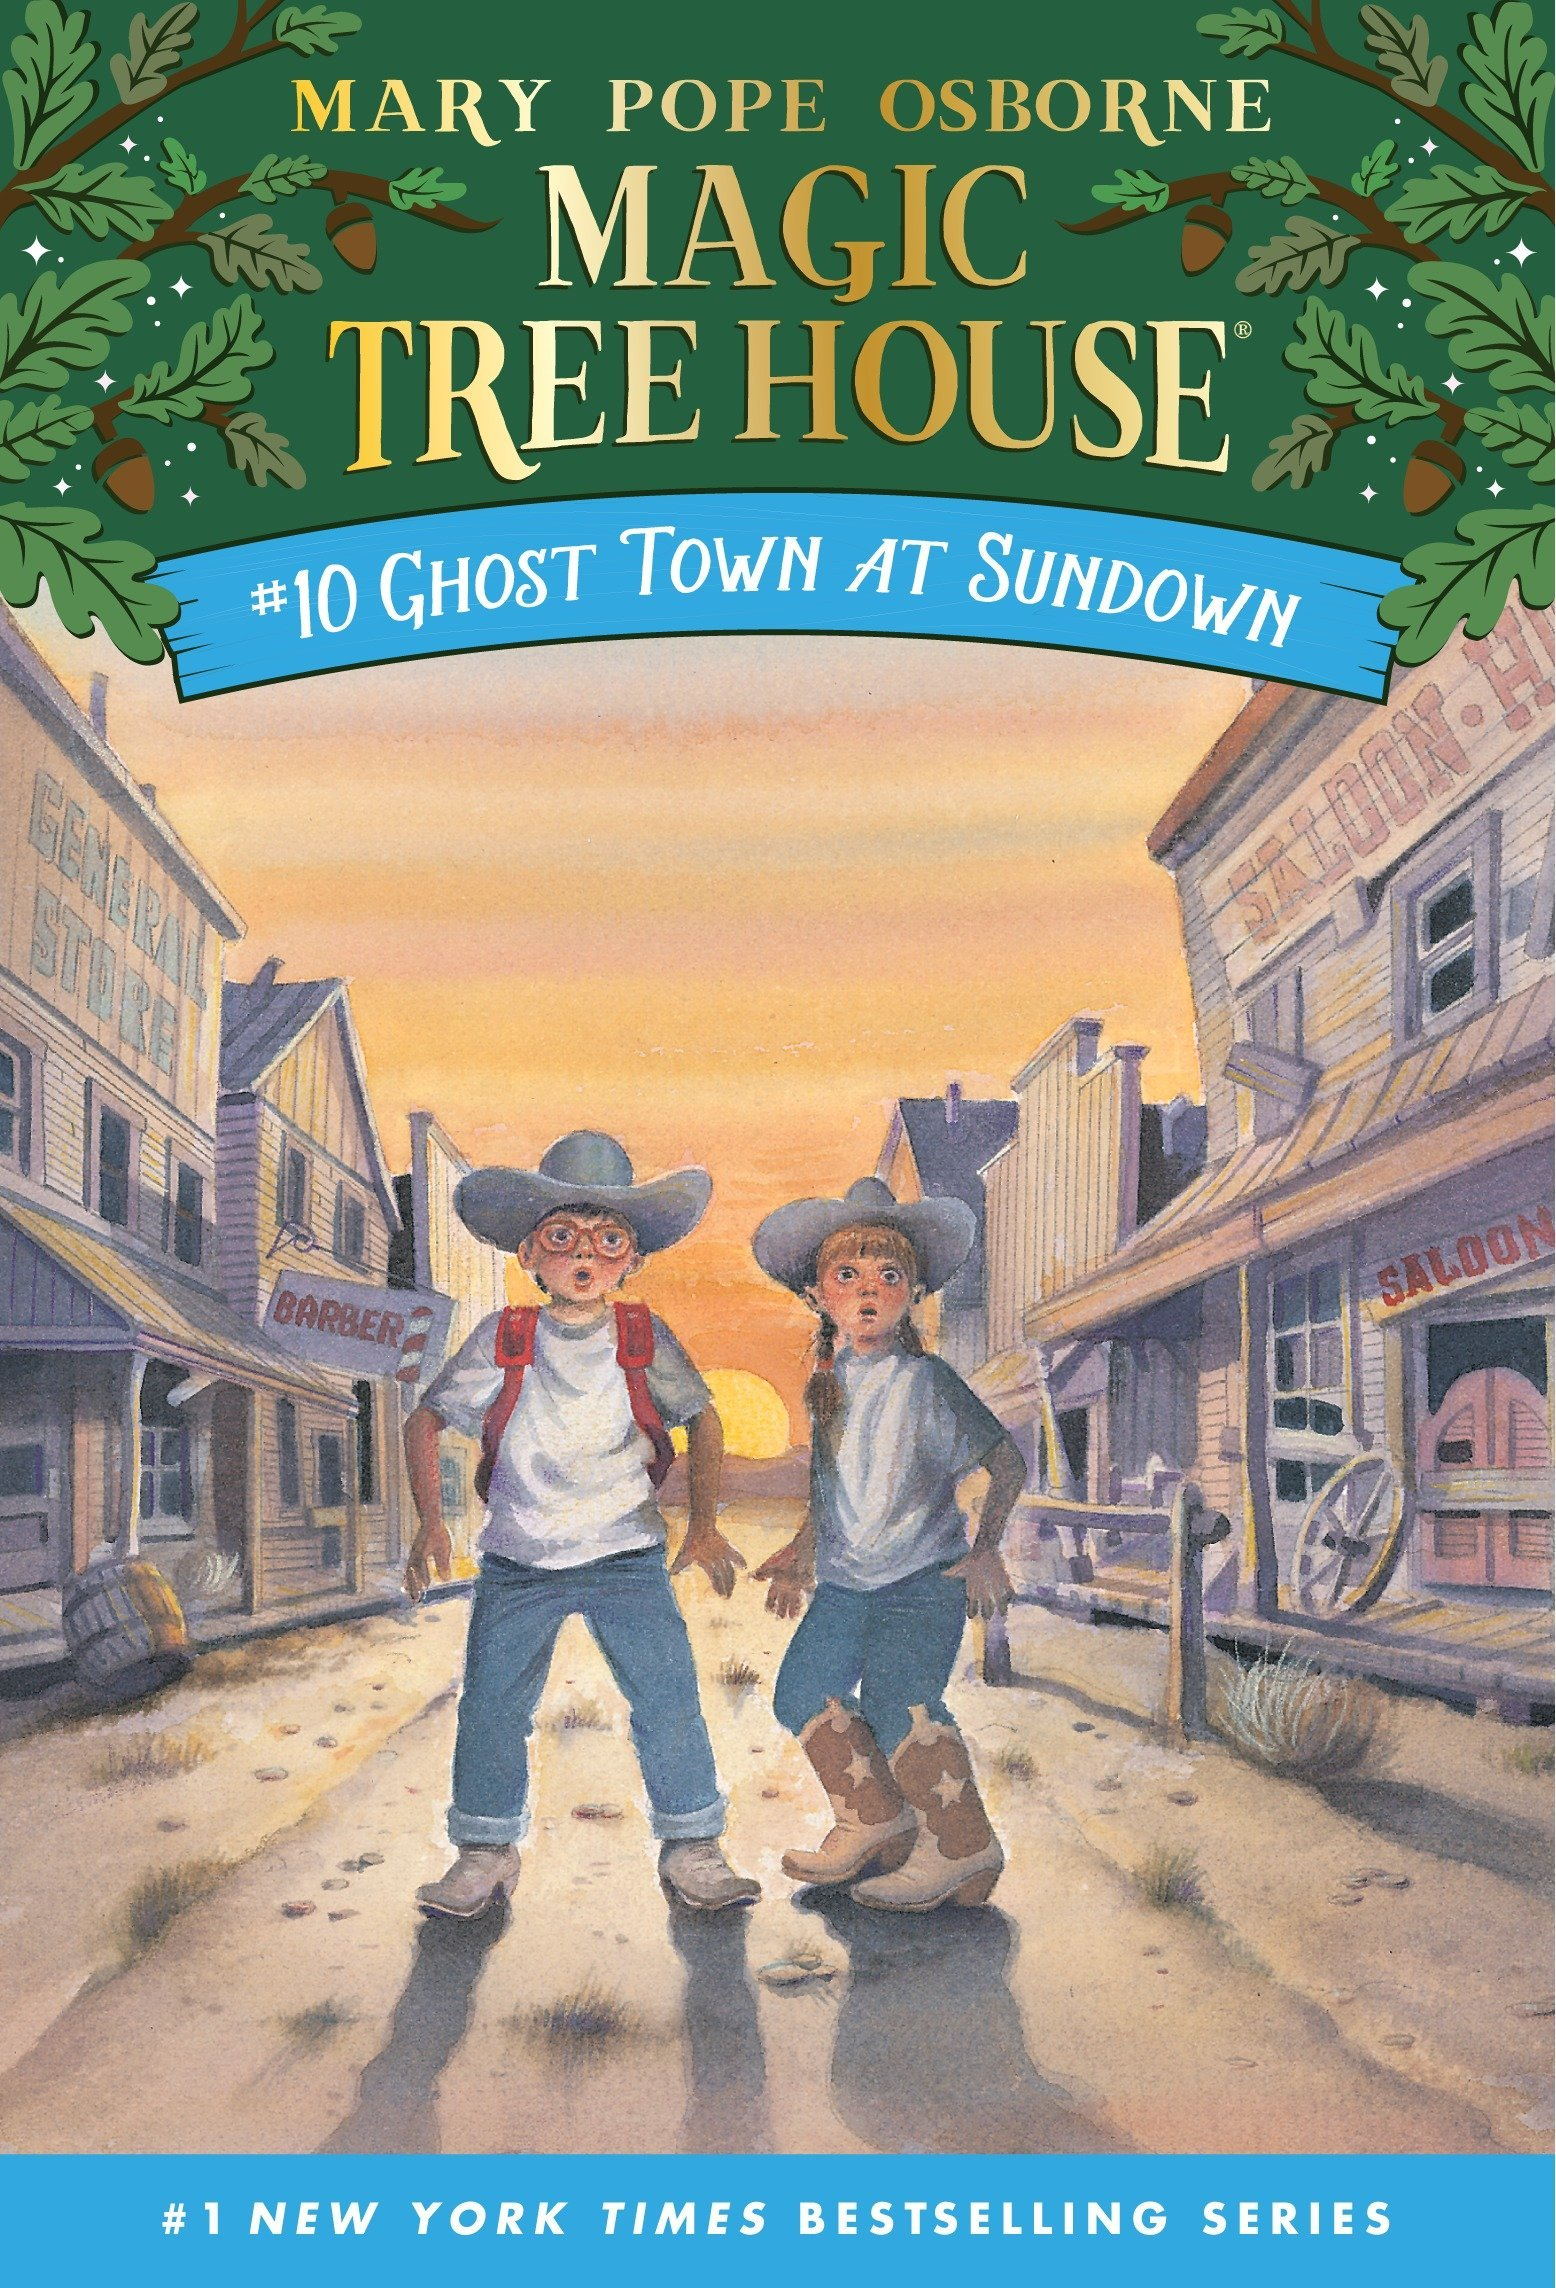 magic tree house book list 1-45